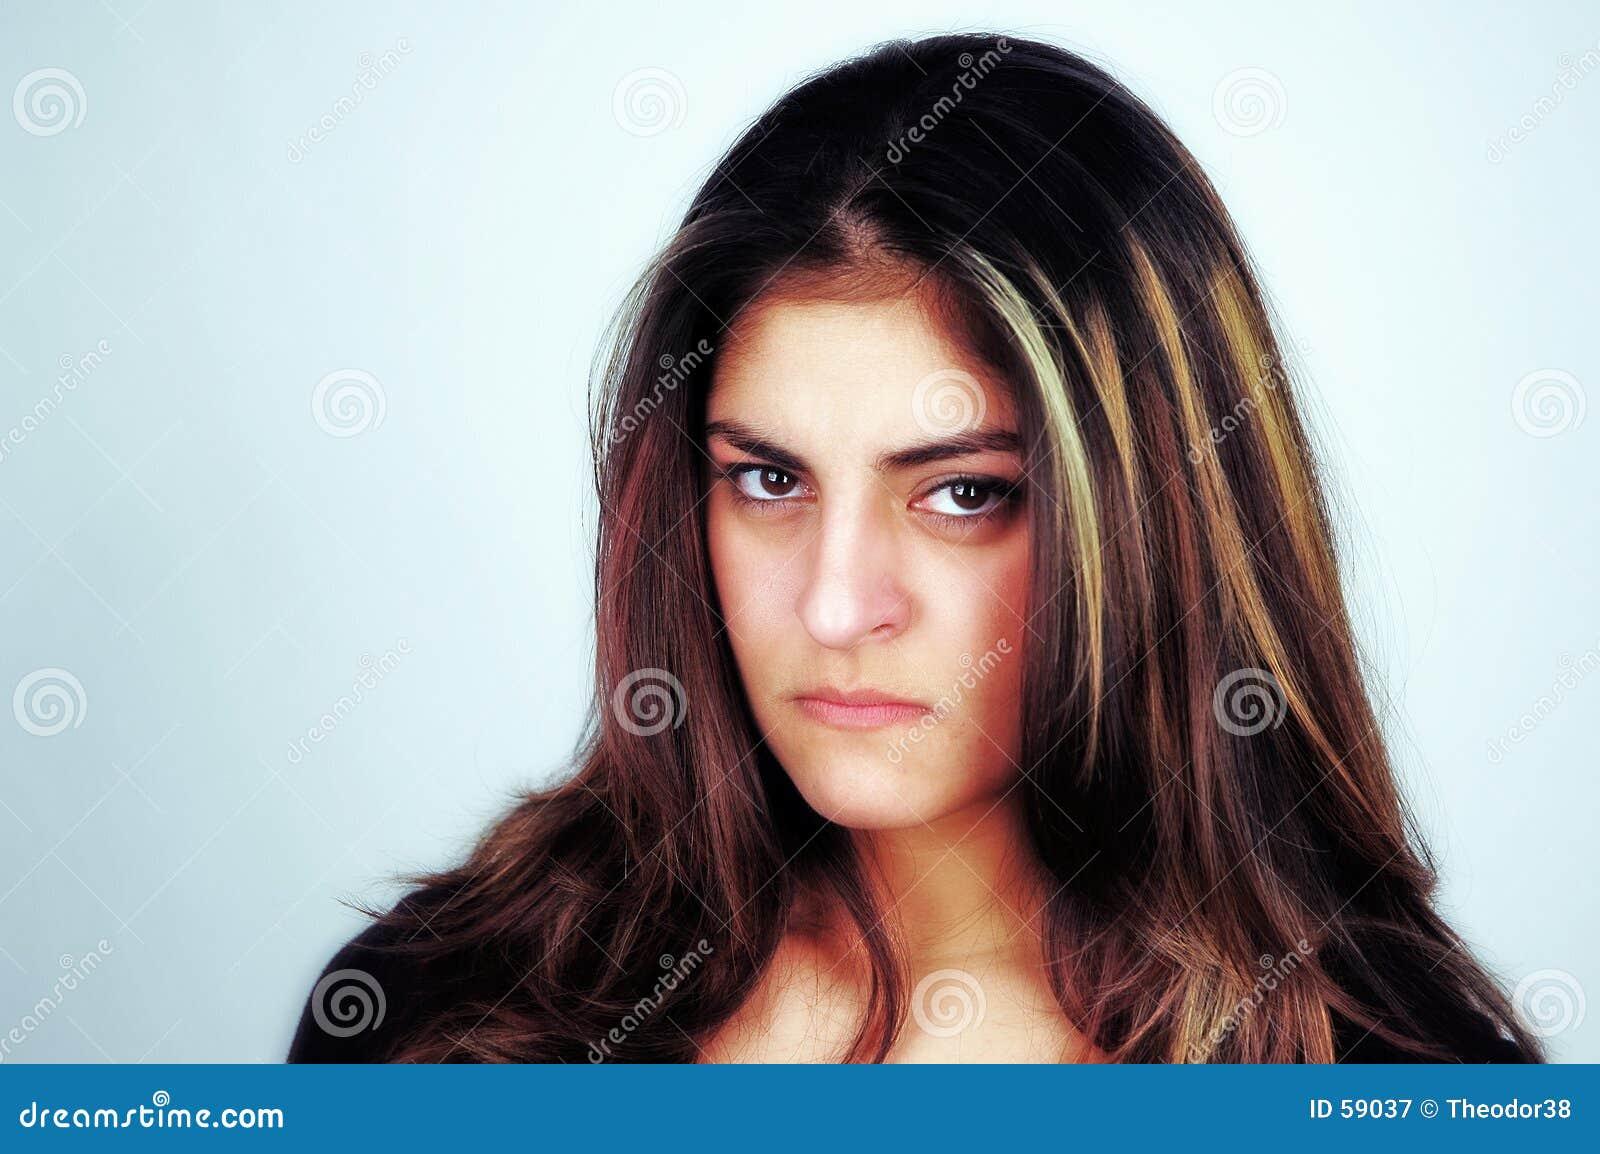 Woman-14 ocasional